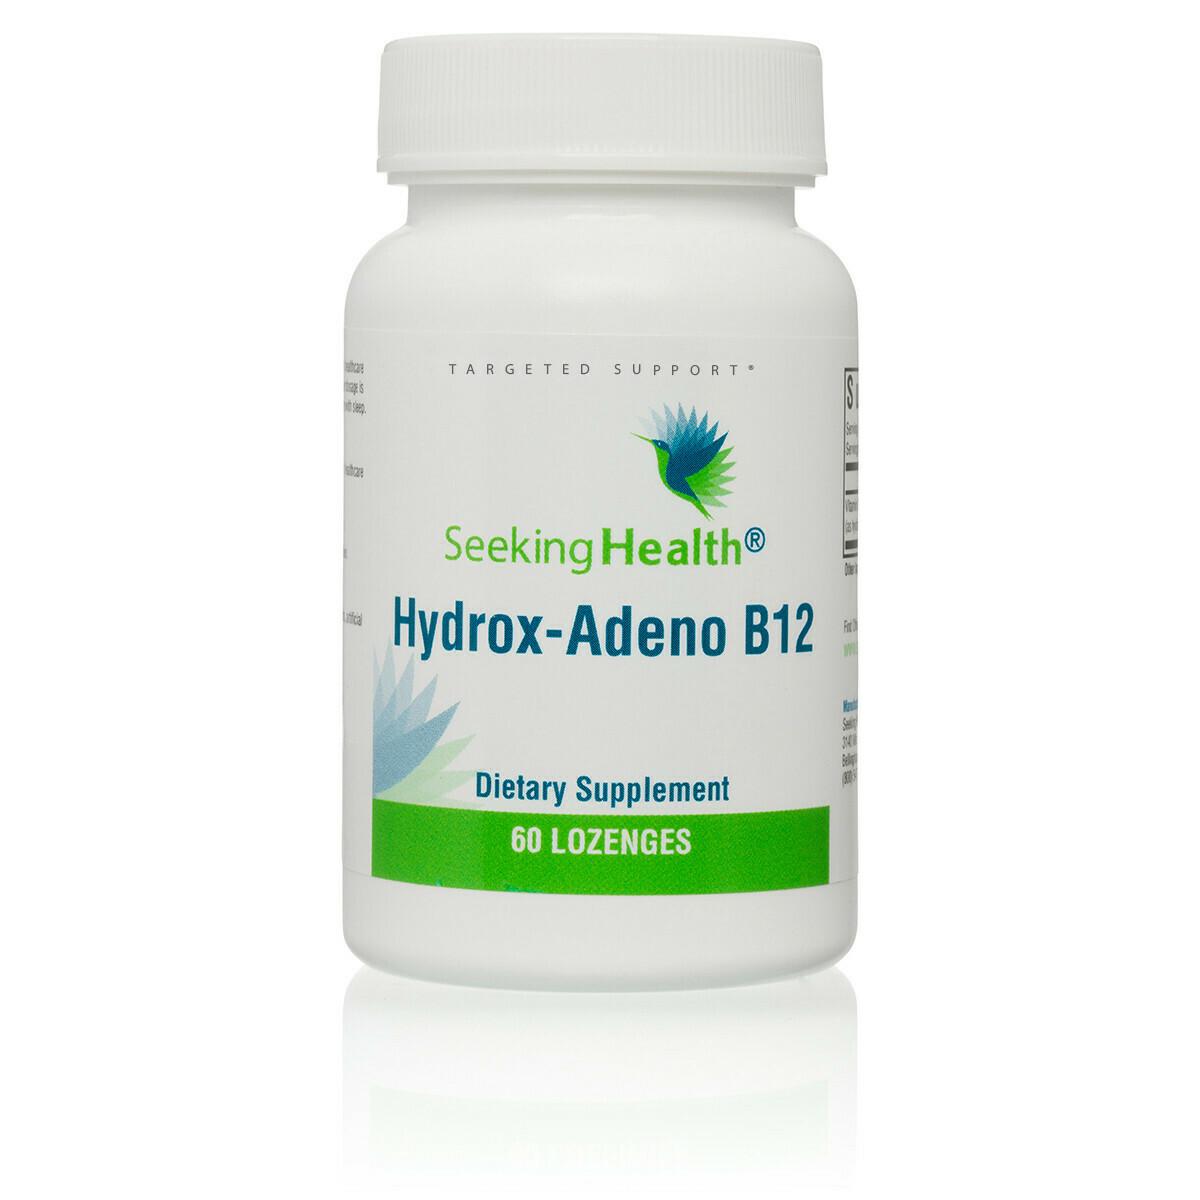 HYDROX-ADENO B12 - 60 LOZENGES Seeking Health